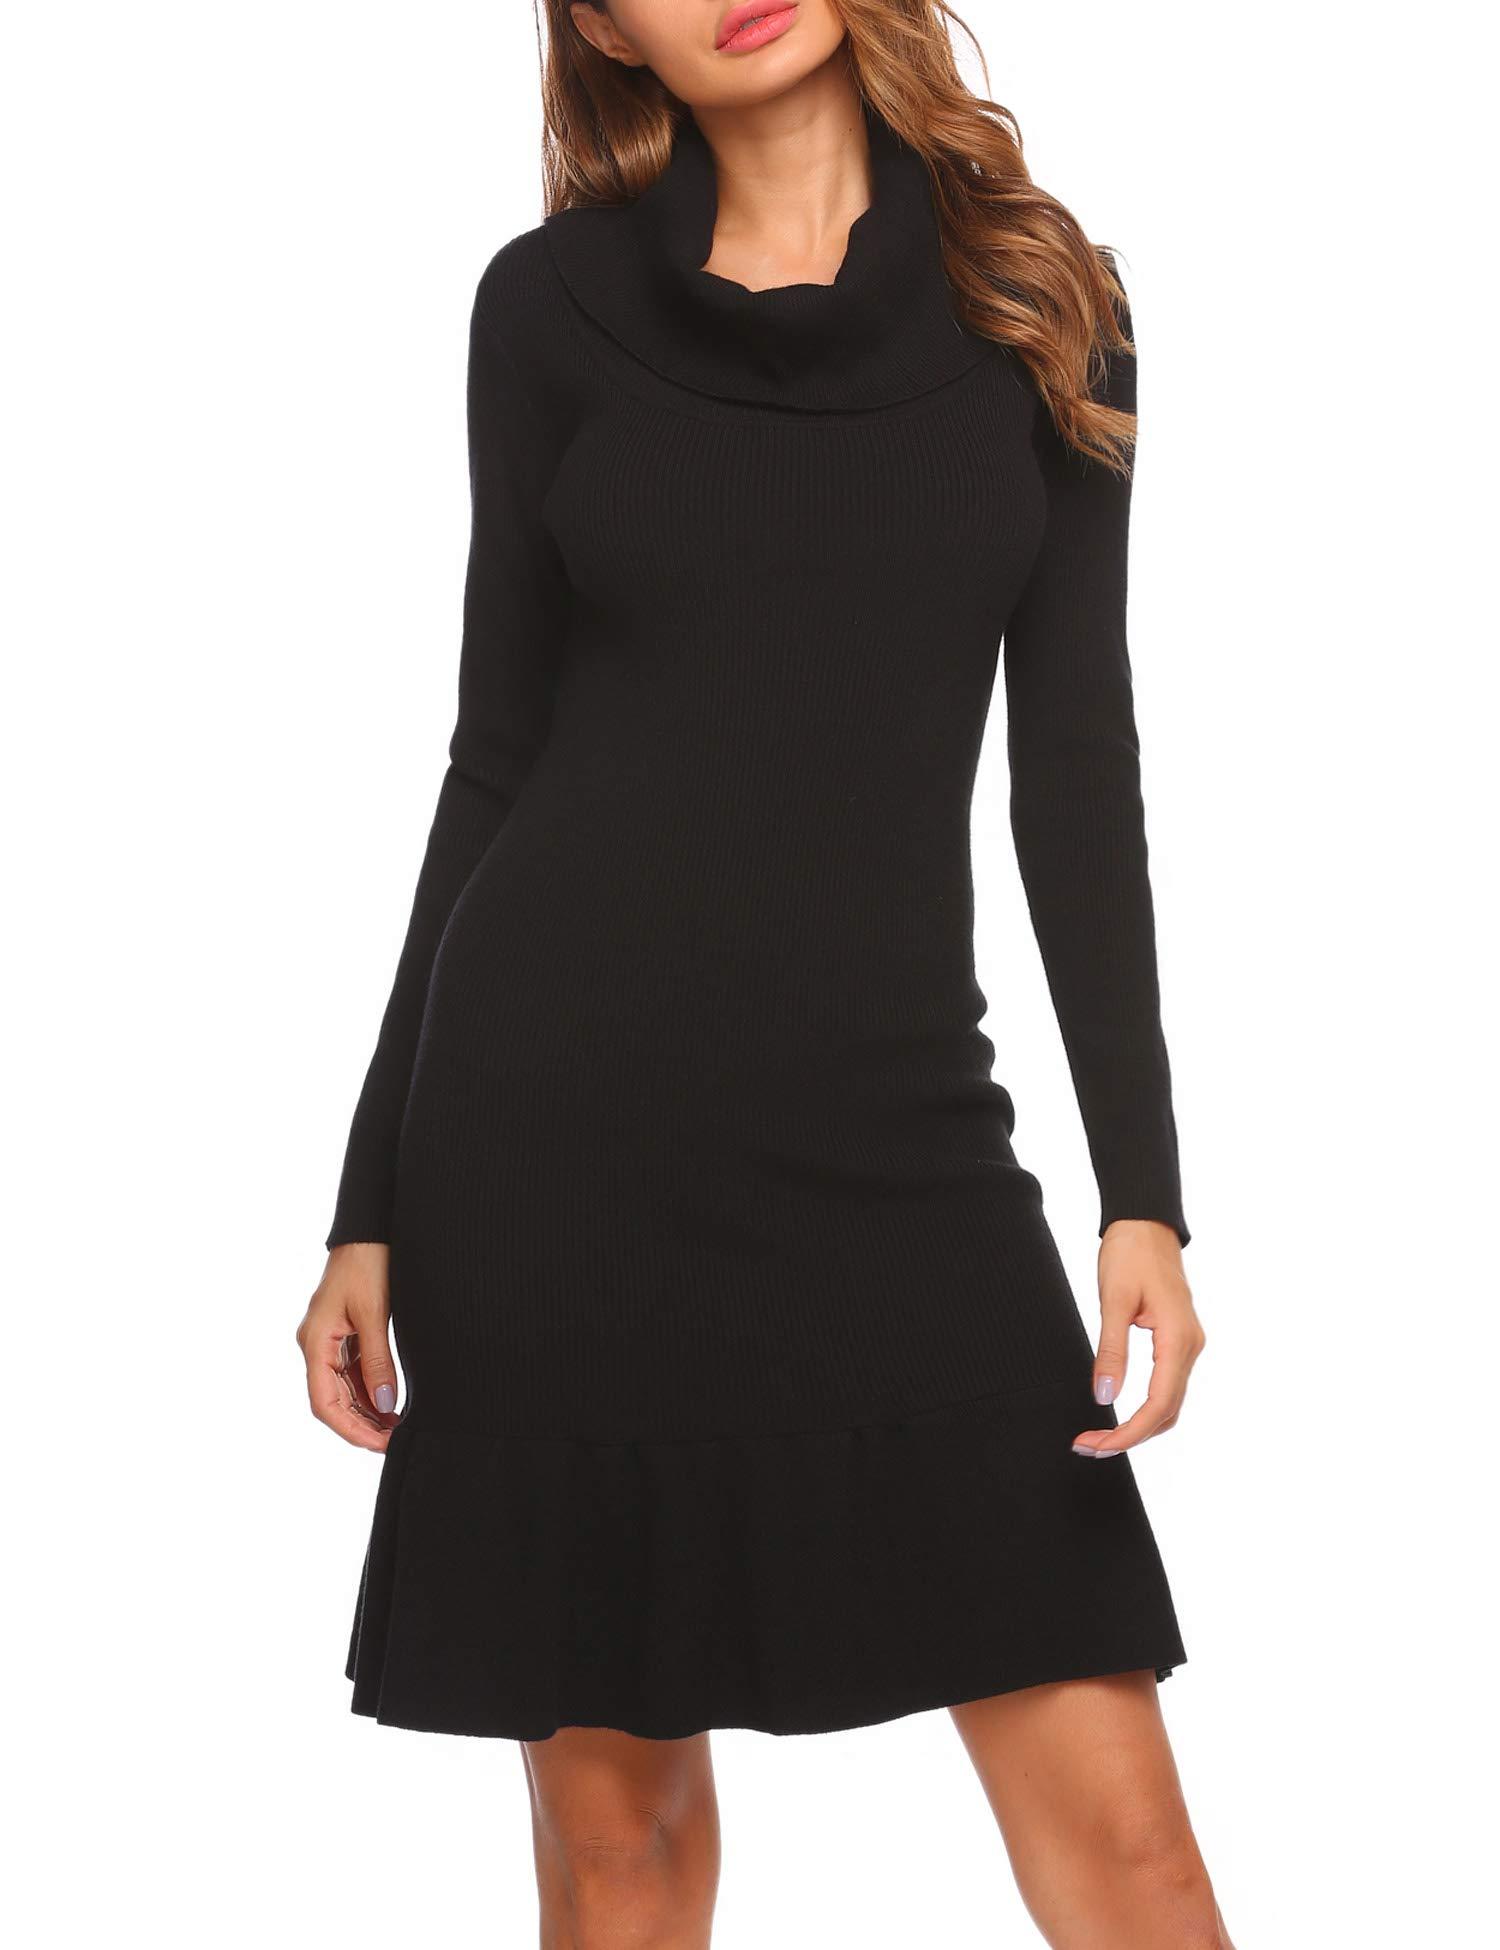 Zeagoo Basic Sweater Dress Women's Long Sleeve Turtleneck Ribbed Elbow Warm Knit Sweater Dress Black XX-Large